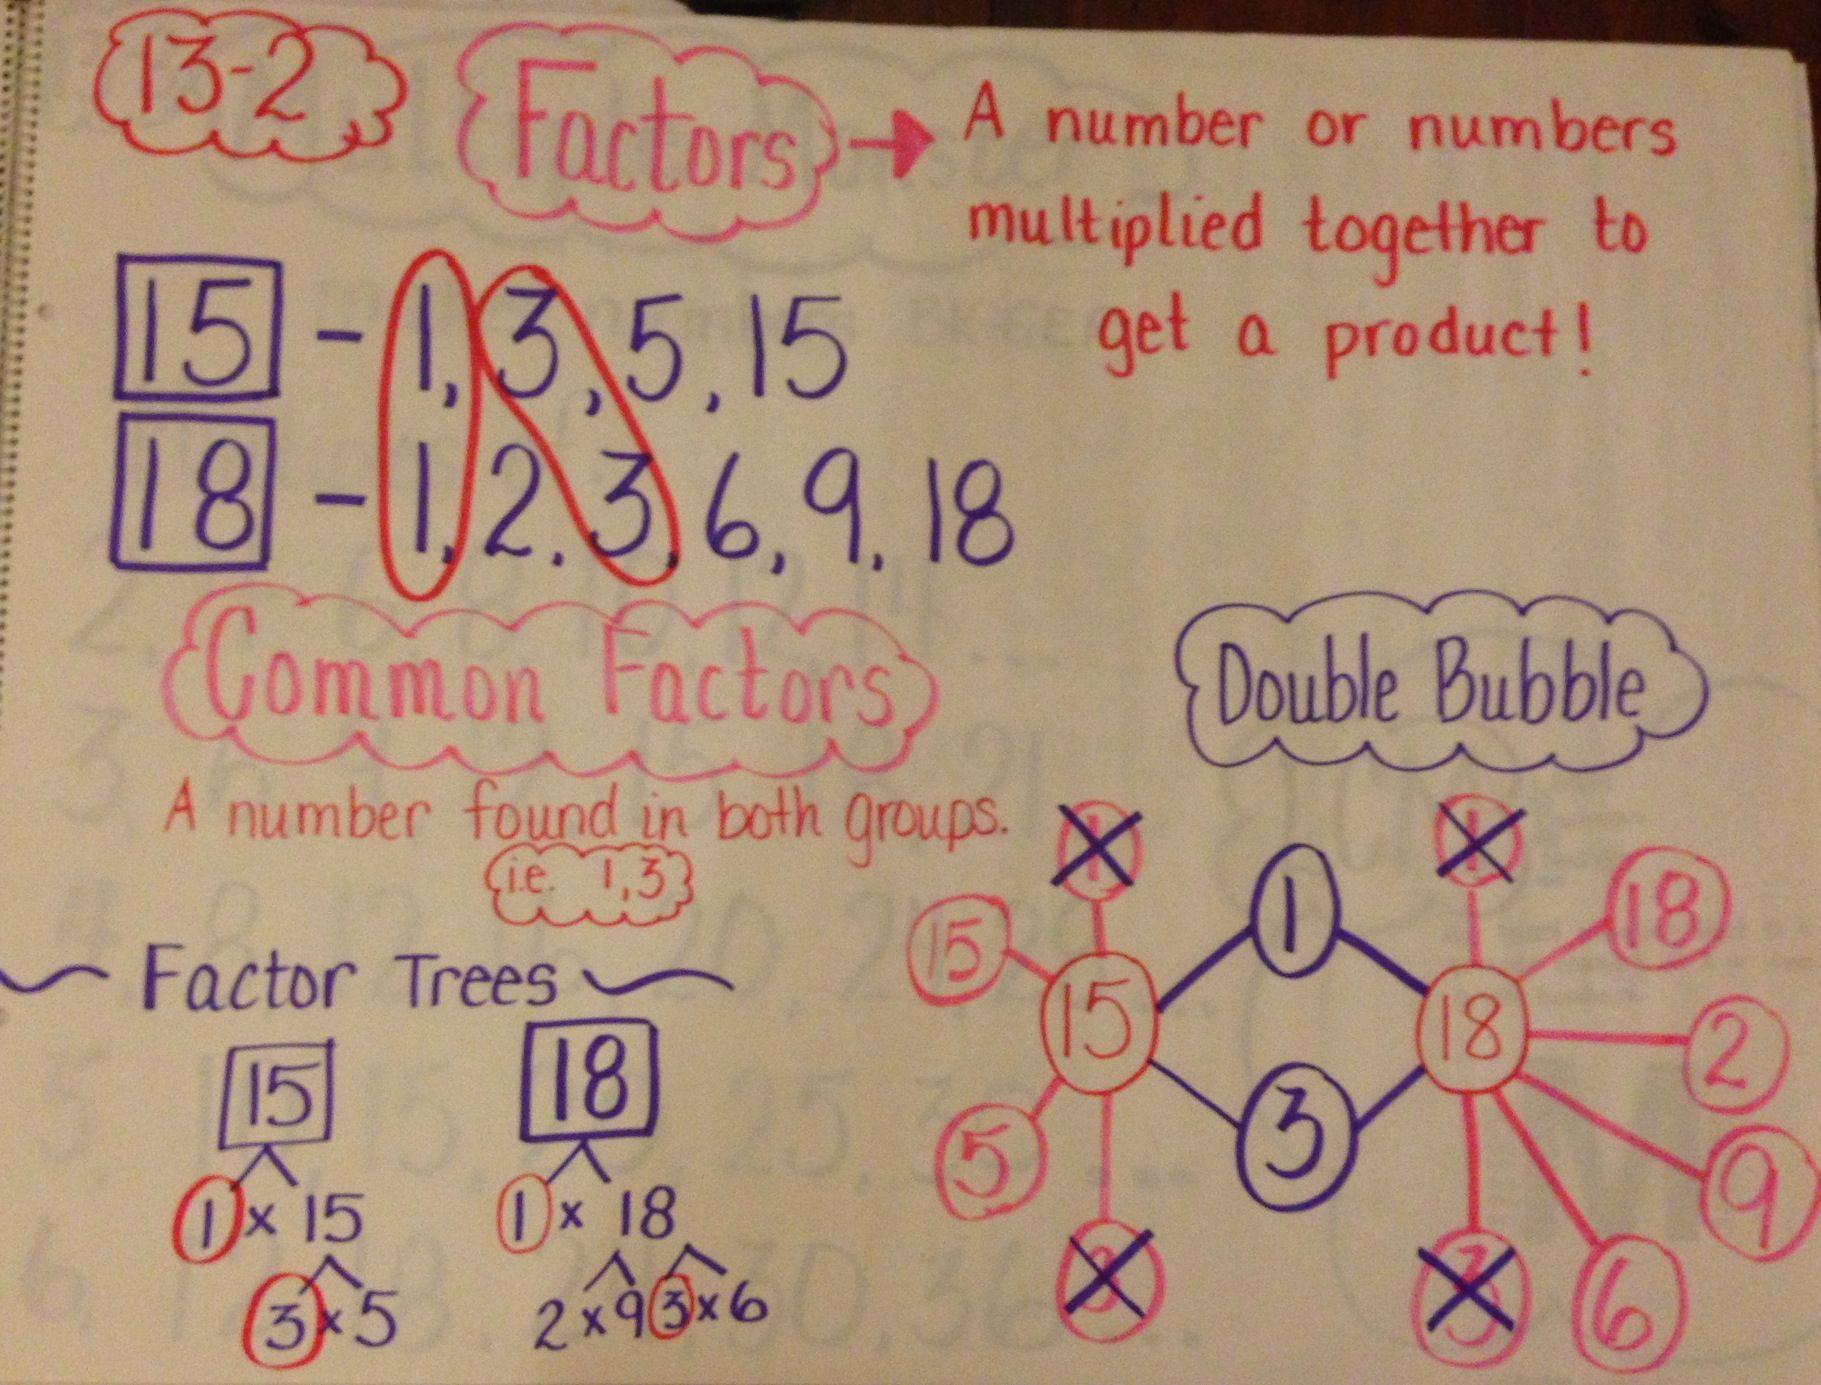 Double Bubble Factors Thinking Maps Math Middle School Math Teacher Thinking Maps [ 1385 x 1821 Pixel ]